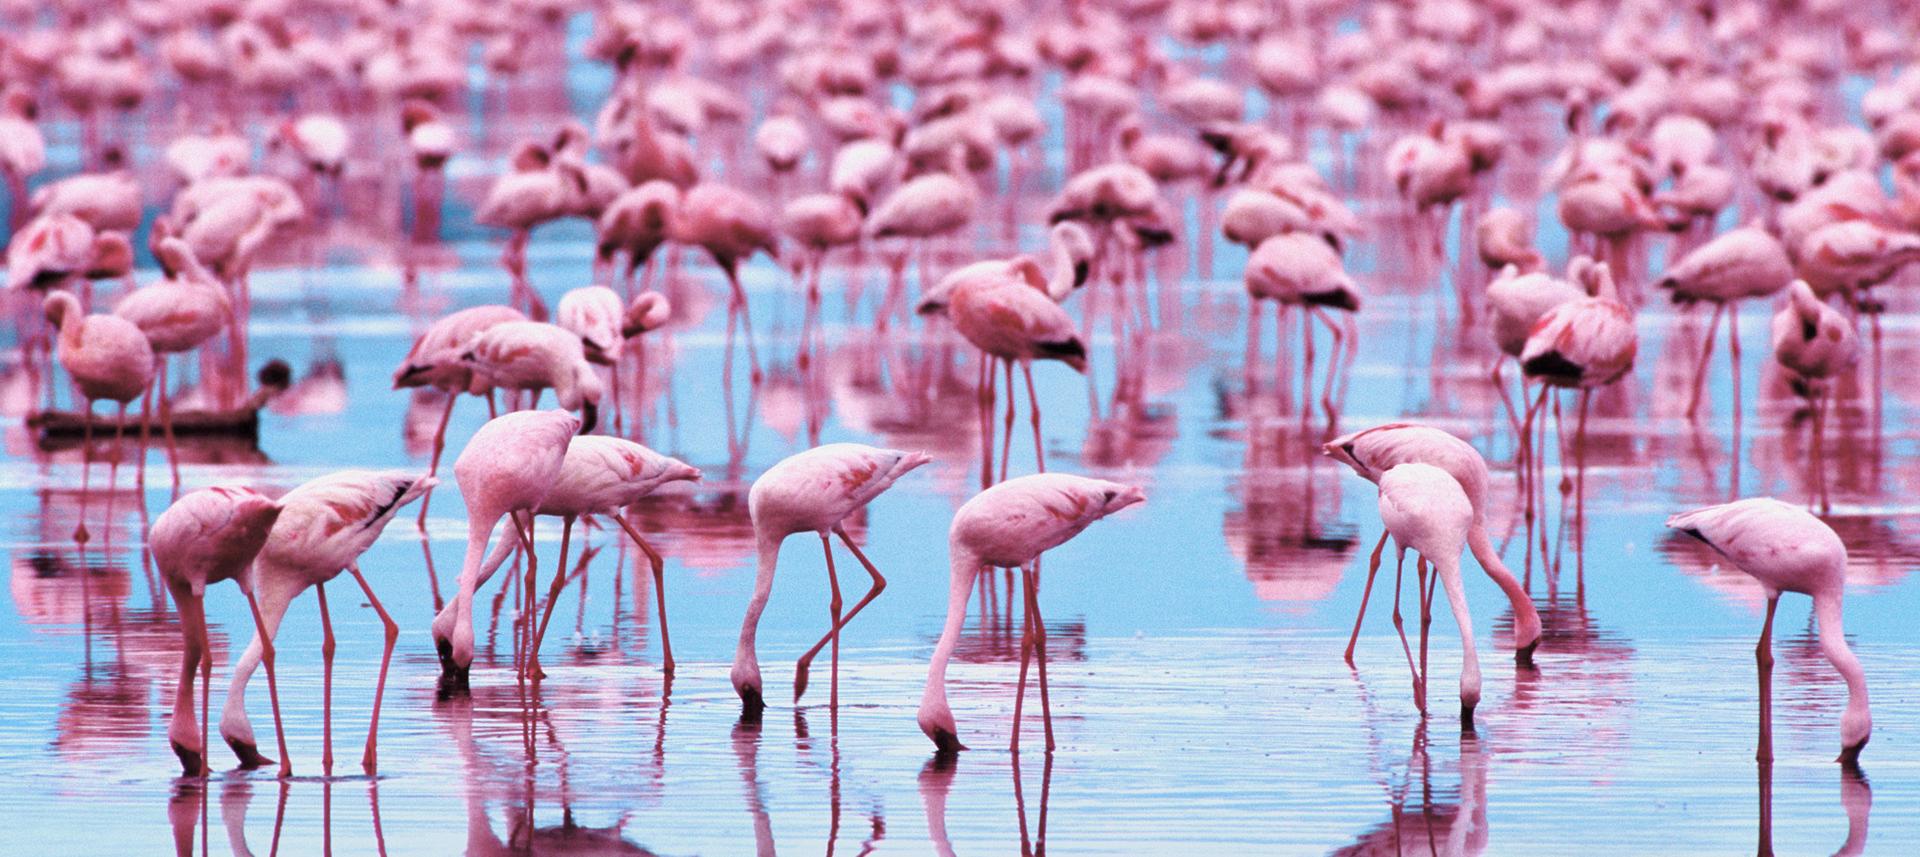 Free Download Flamingo Wallpaper Wallpapers Hd Desktop